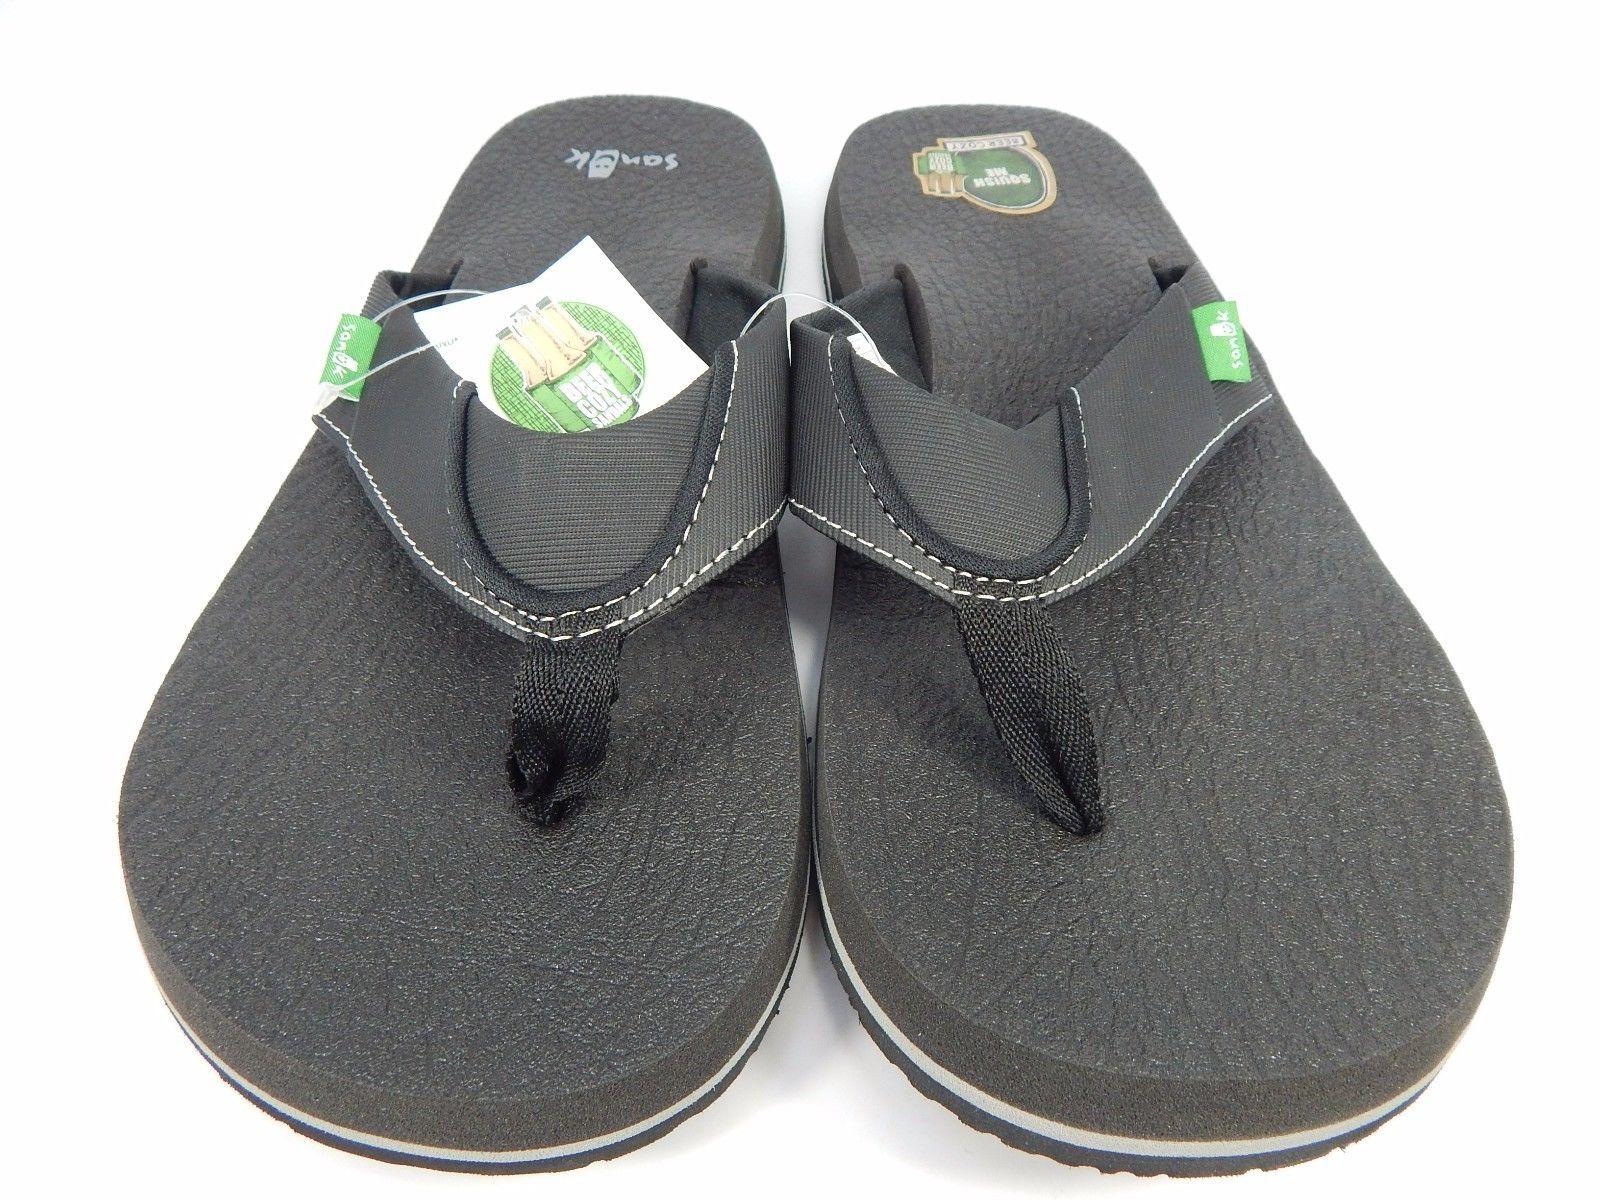 Sanuk Beer Cozy Men's Sandals Flip- Flop Size US 9 EU 42 Black SMS2839 BLK